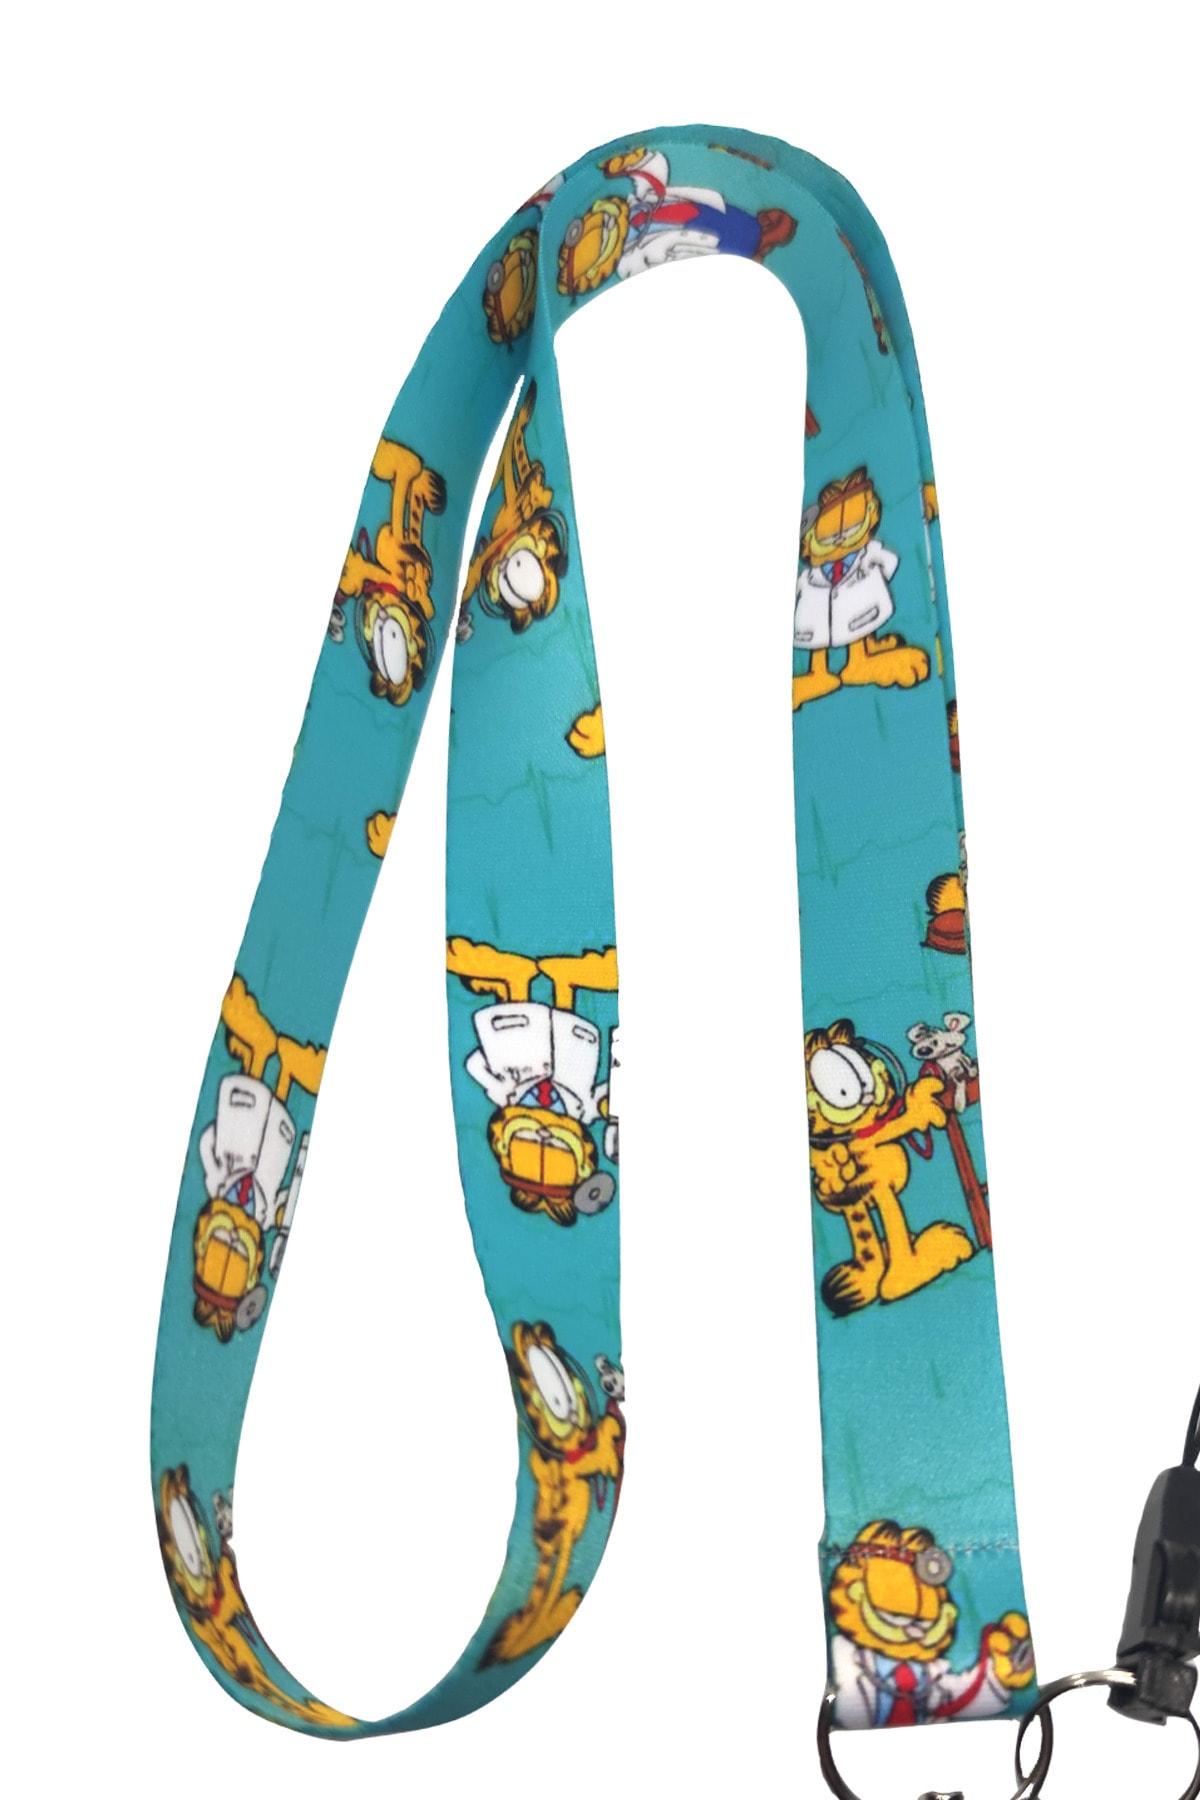 StormiStoretr Garfield Desenli Limited Edition Boyun Ipi Telefon Askısı 2